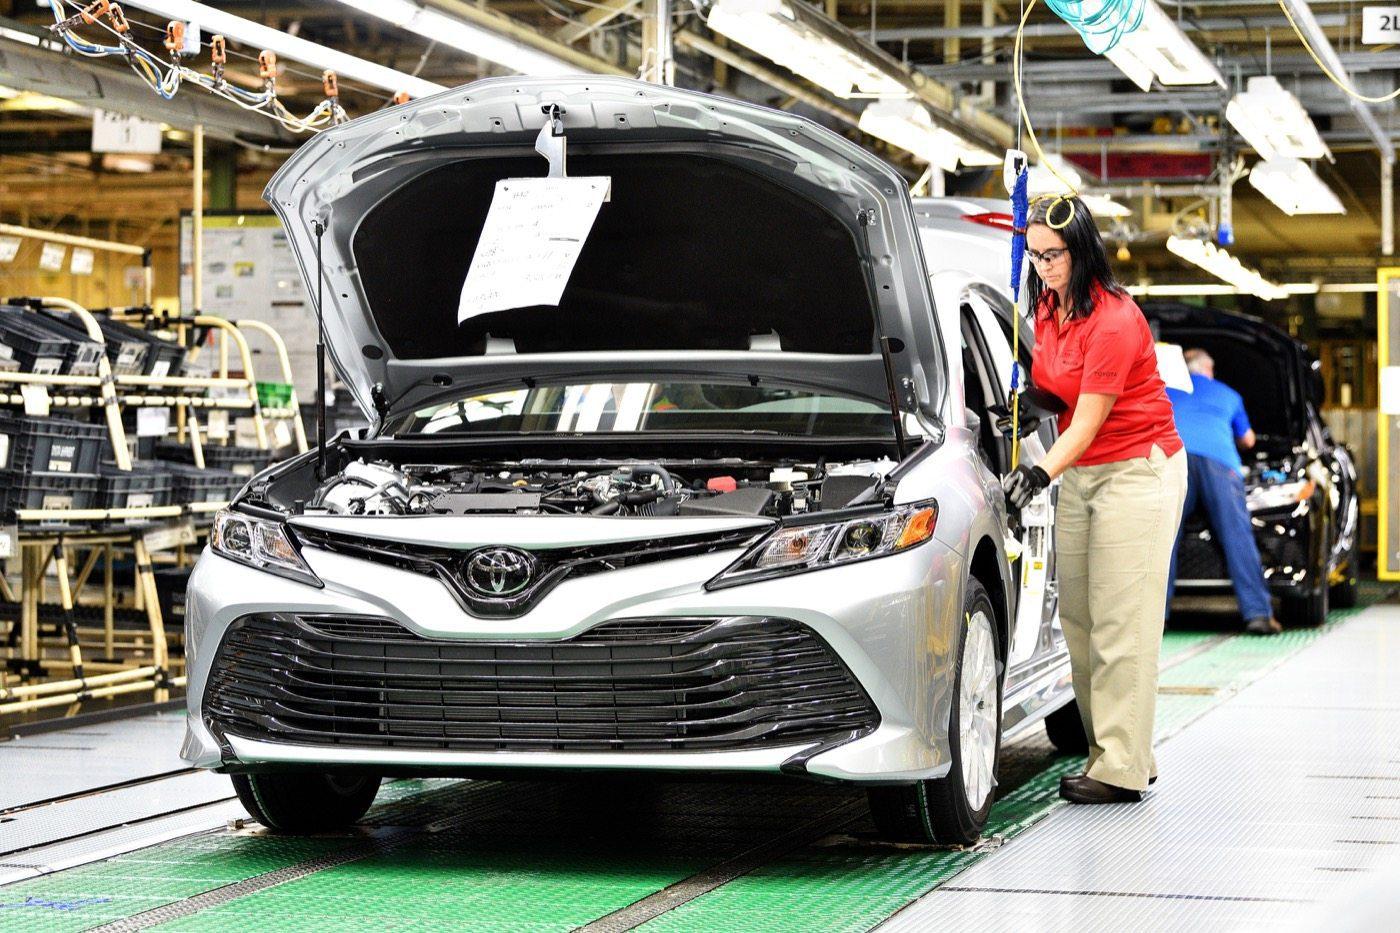 2018 Toyota Camry Kentucky Factory - Image: Toyota